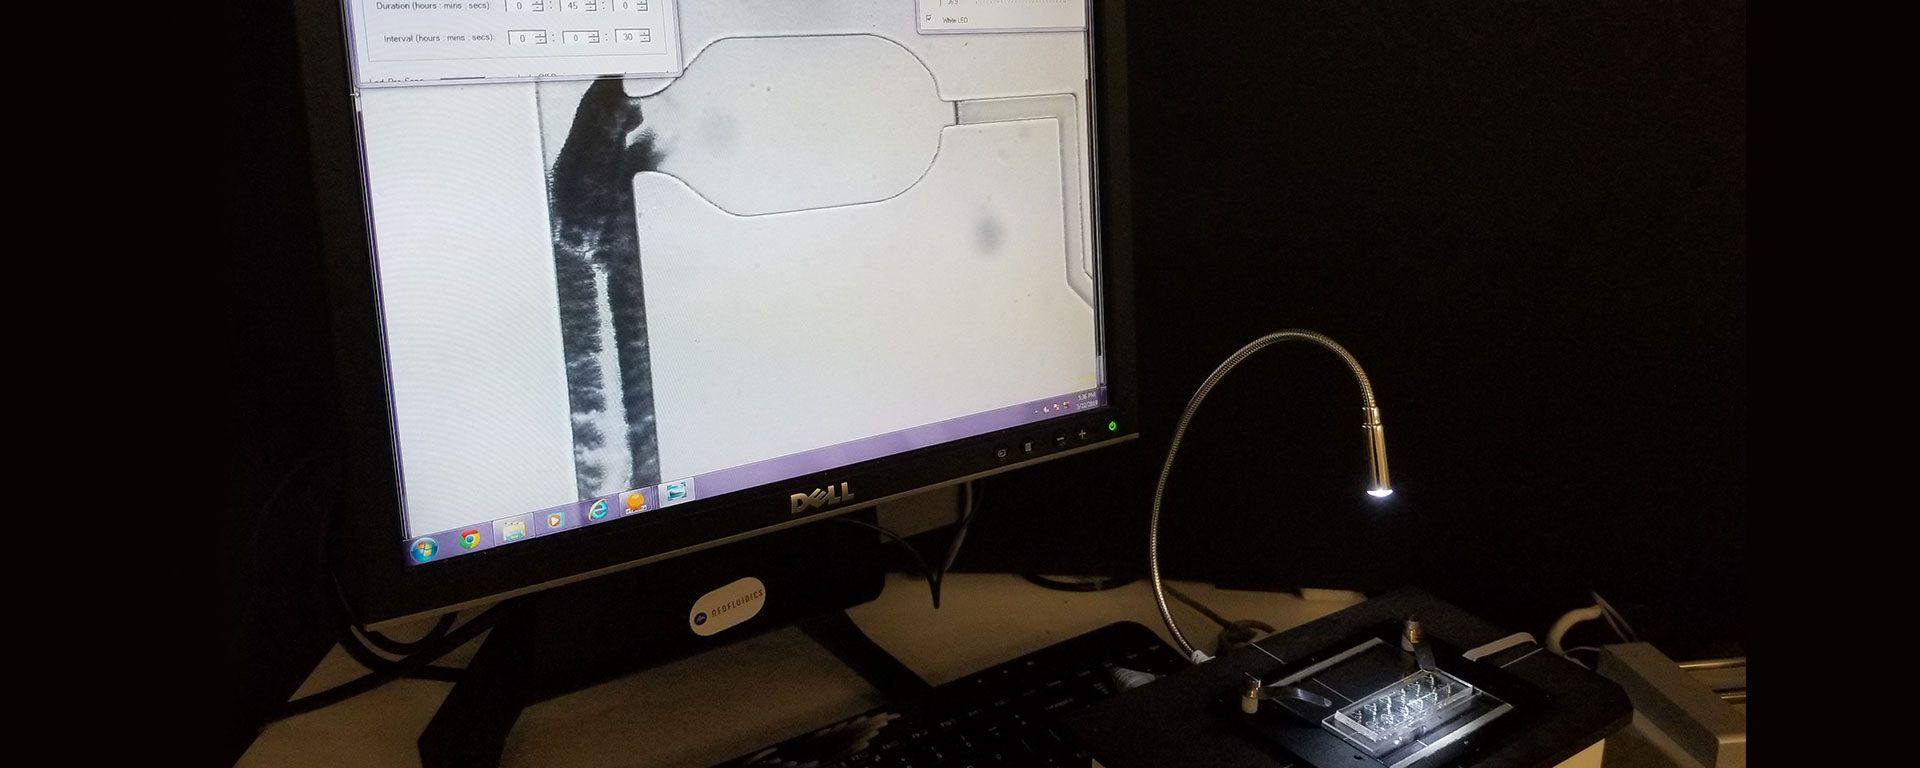 zebra fish microfluidics